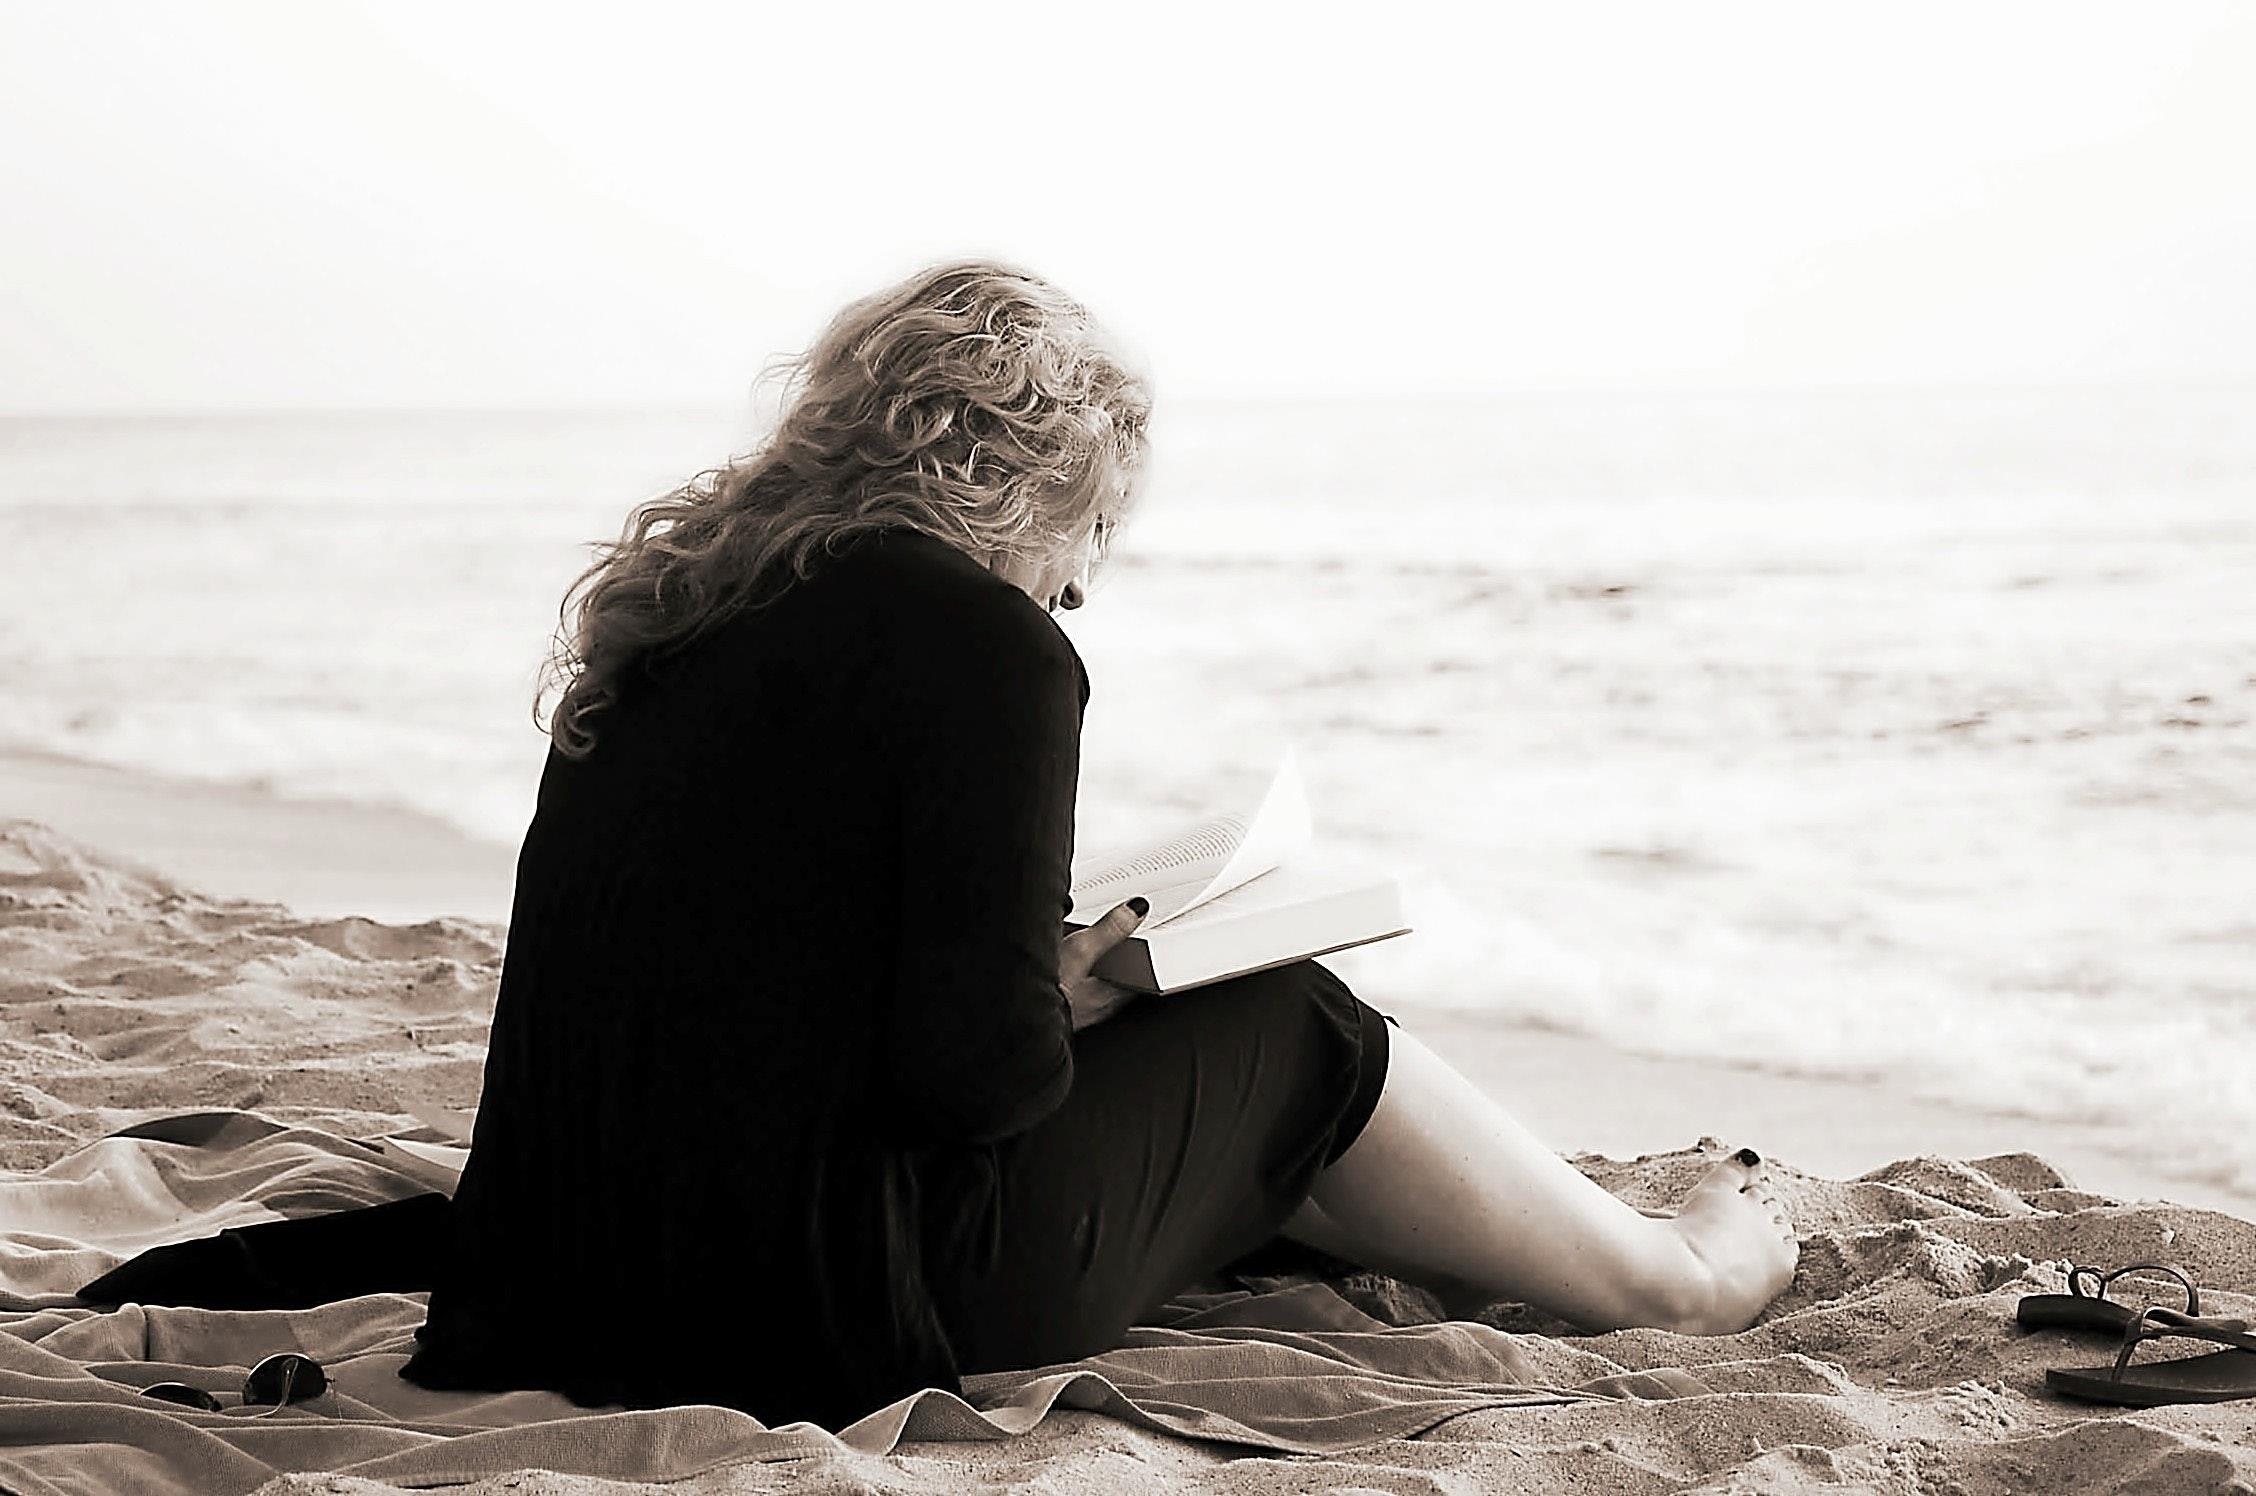 111c beach-lady-ocean-54578.jpg